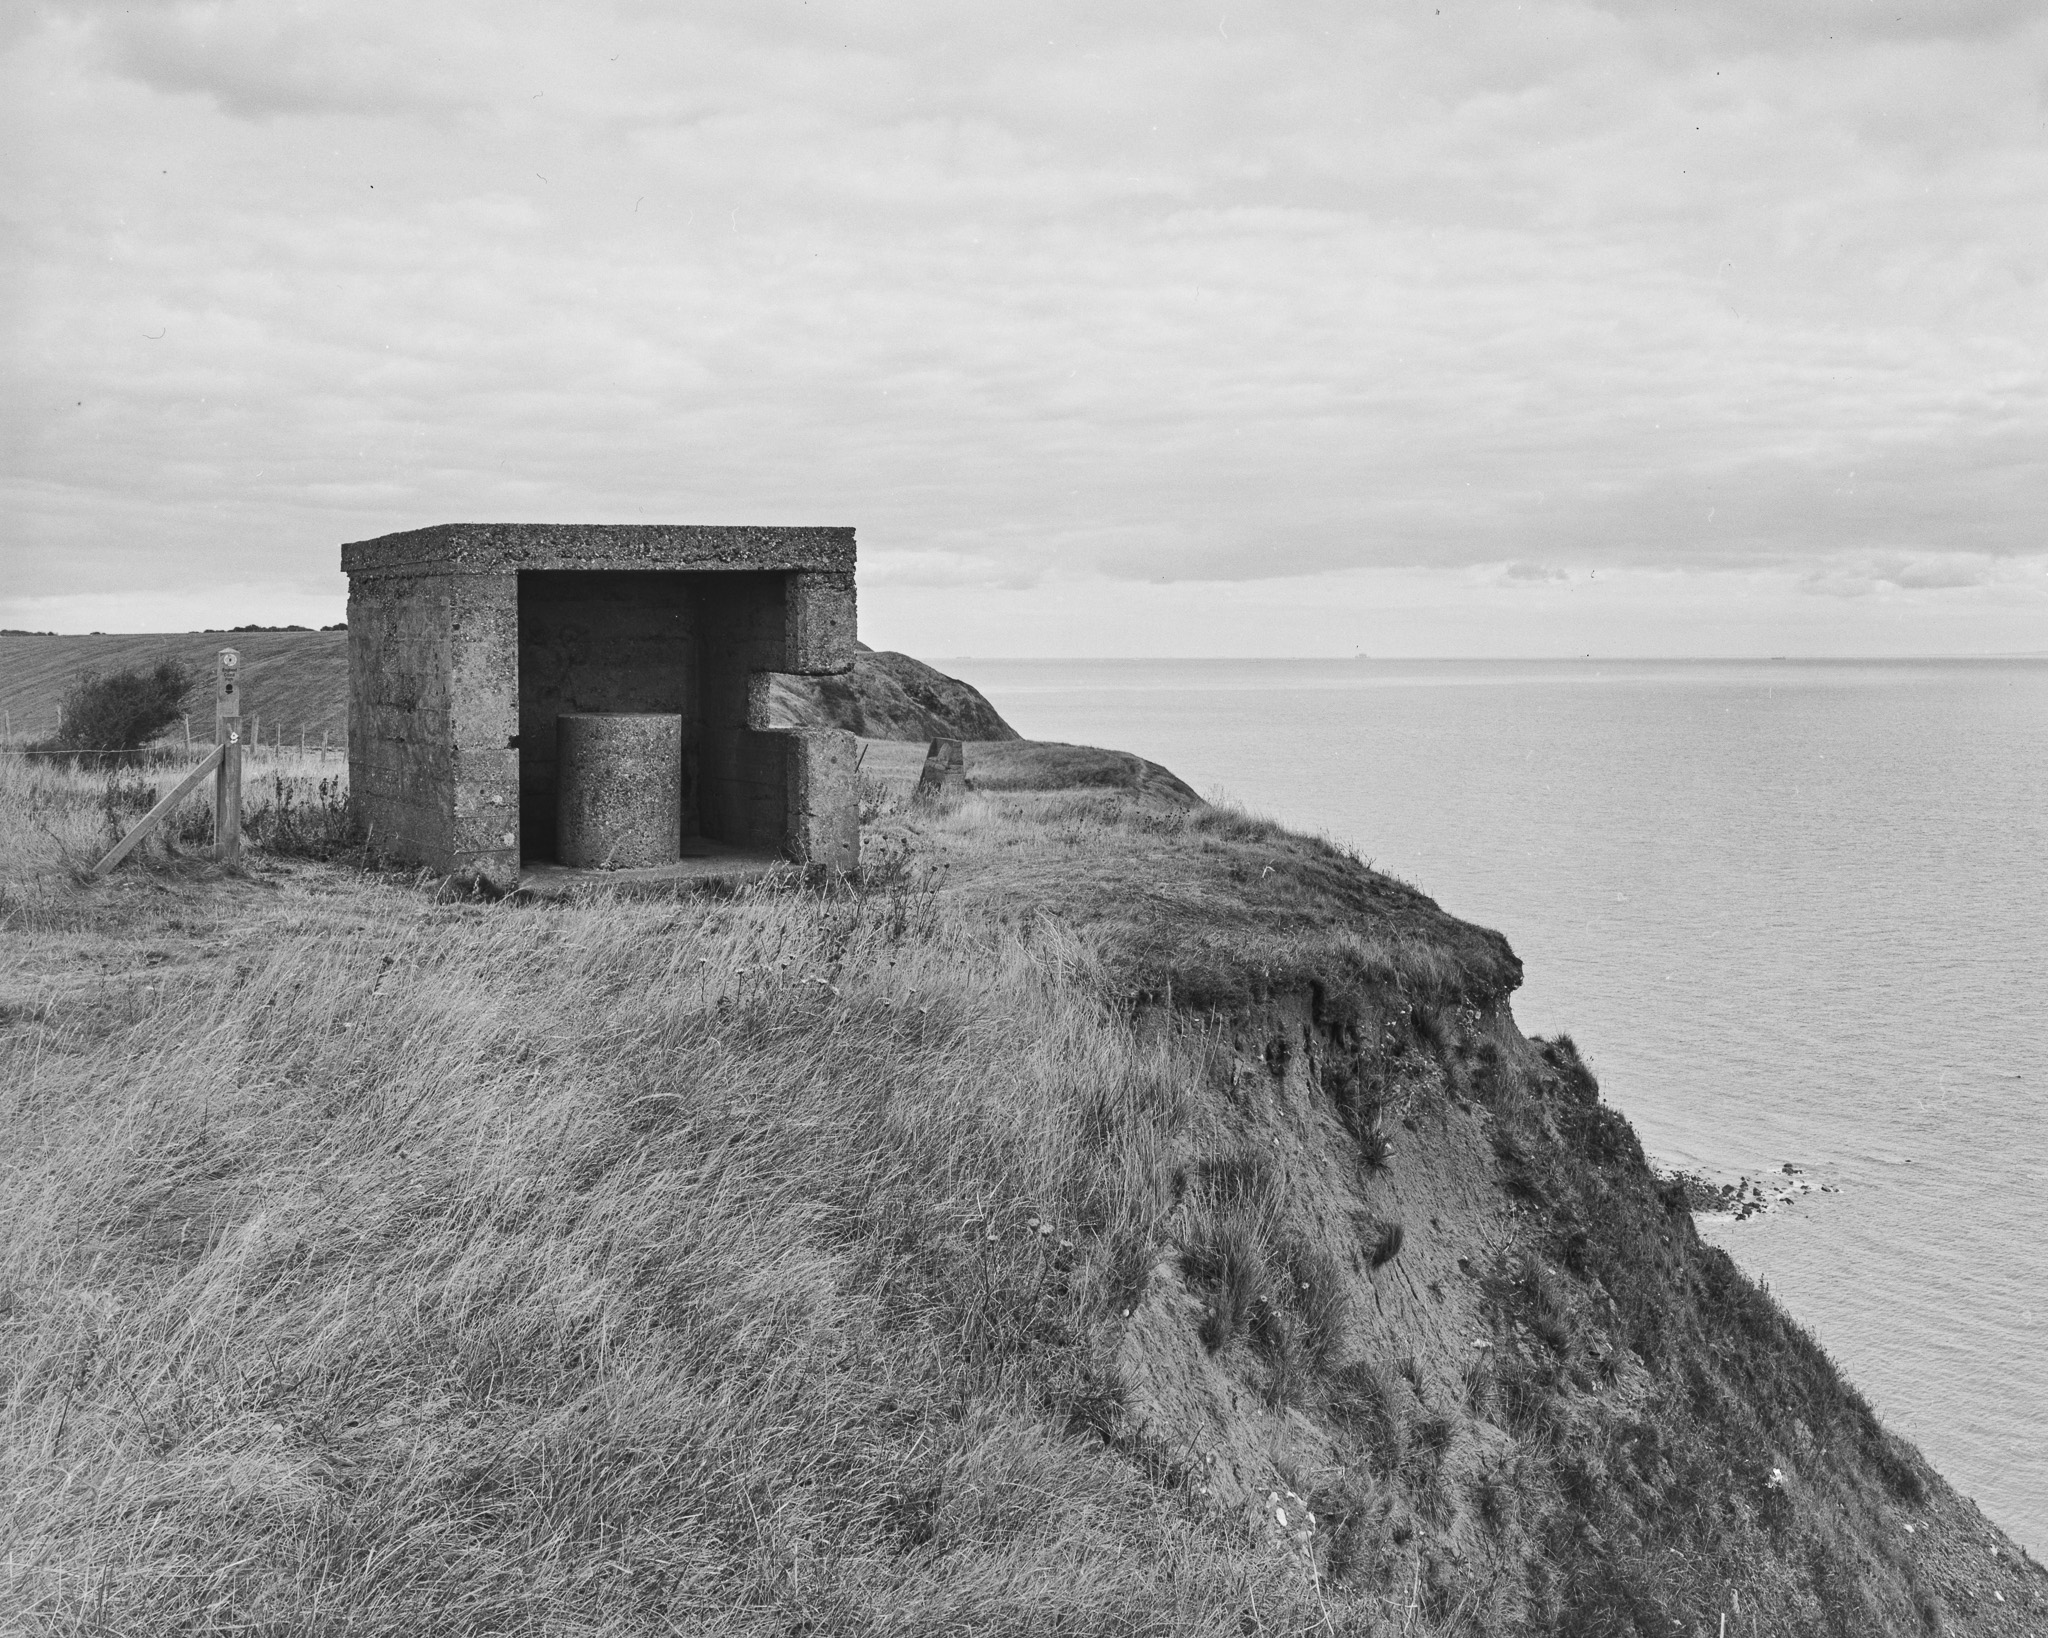 Gun Emplacement Abbot's Cliff (5x4)